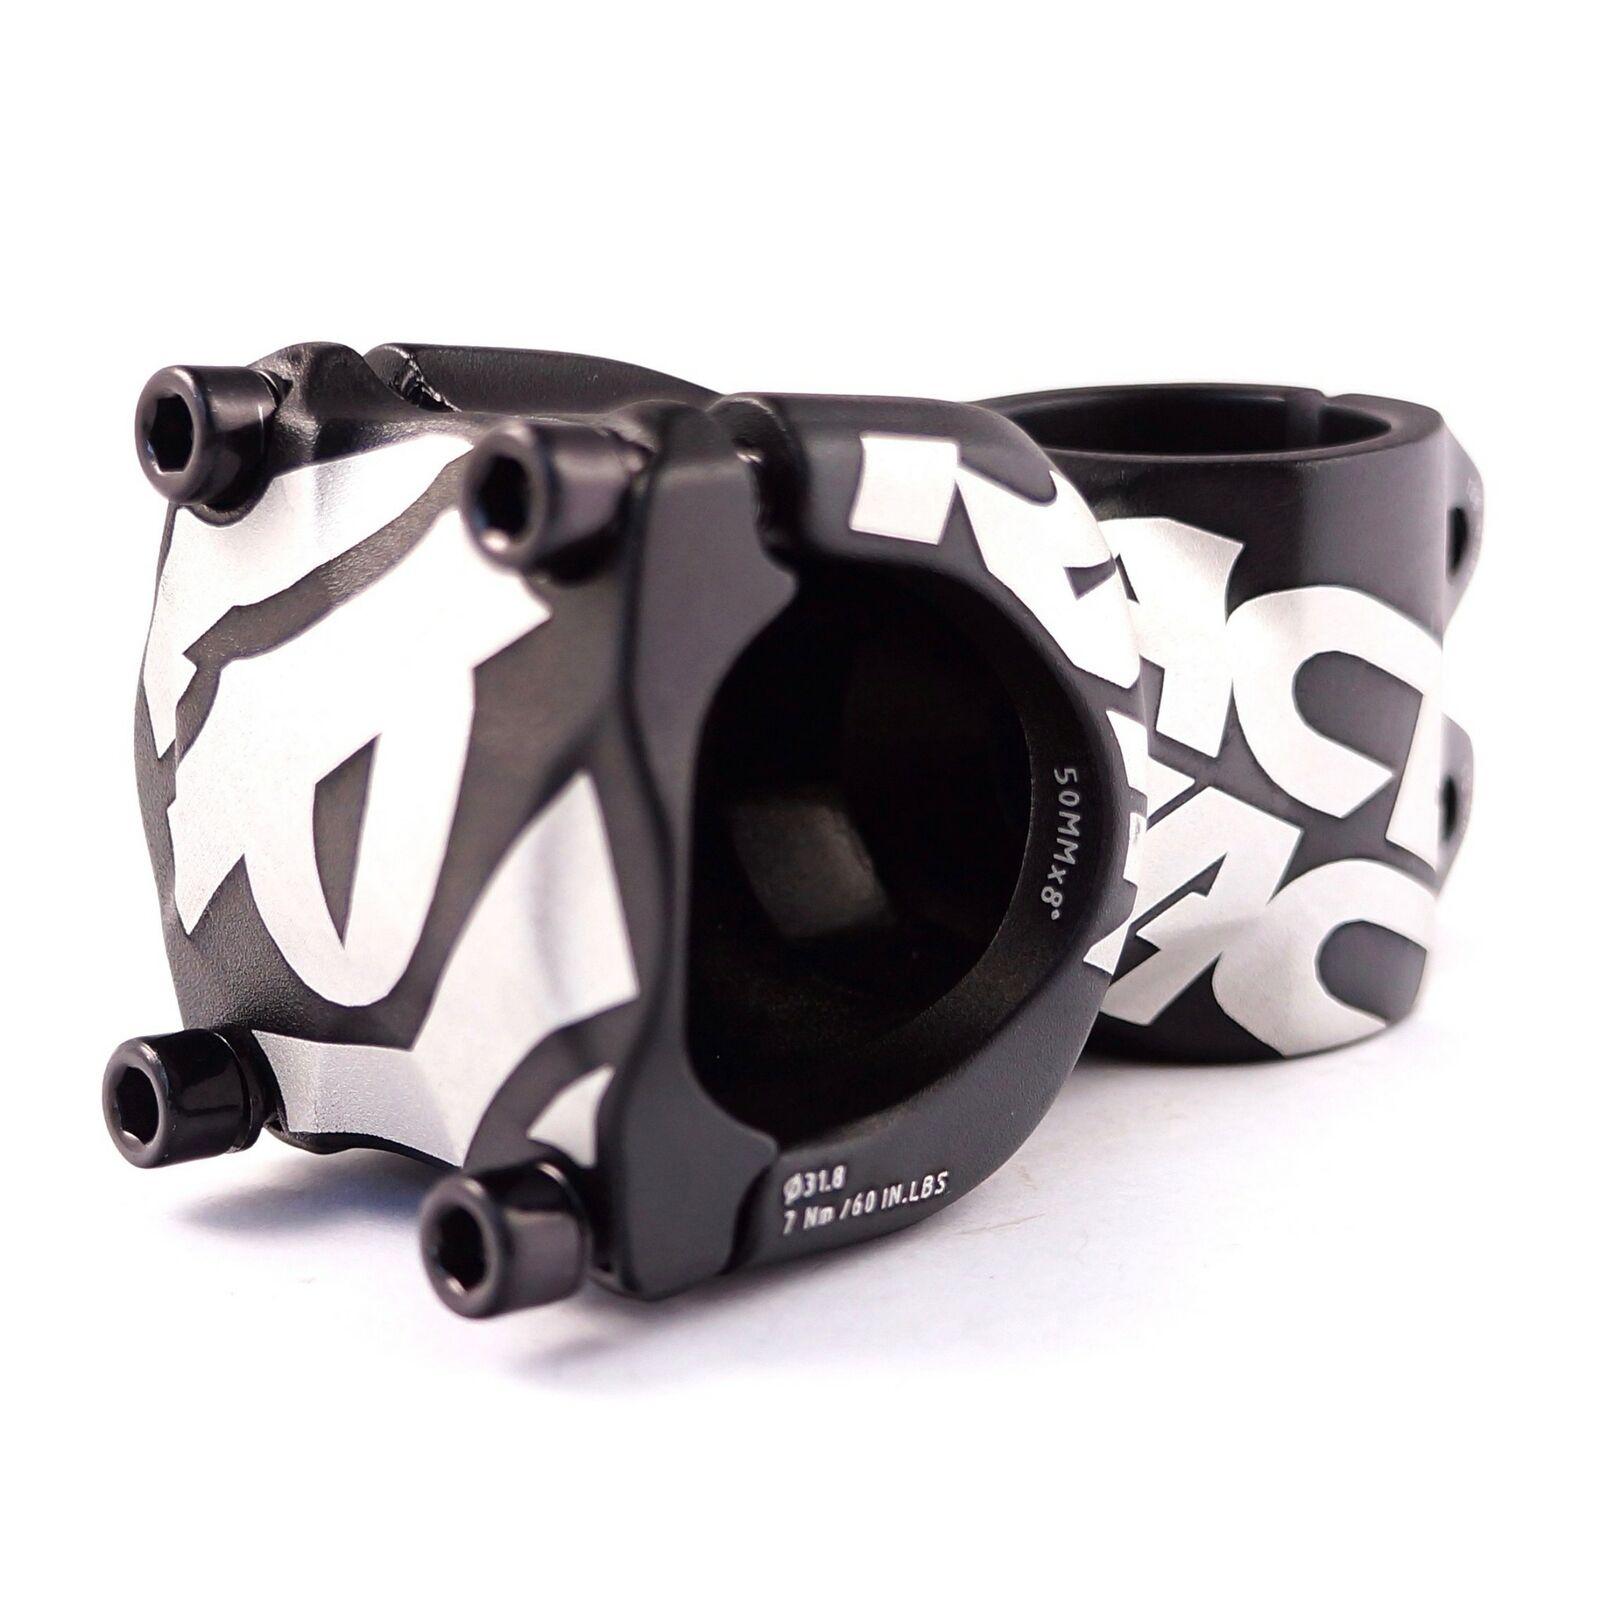 Black Azonic Club Stem 45-50mm Extension 31.8 Clamp